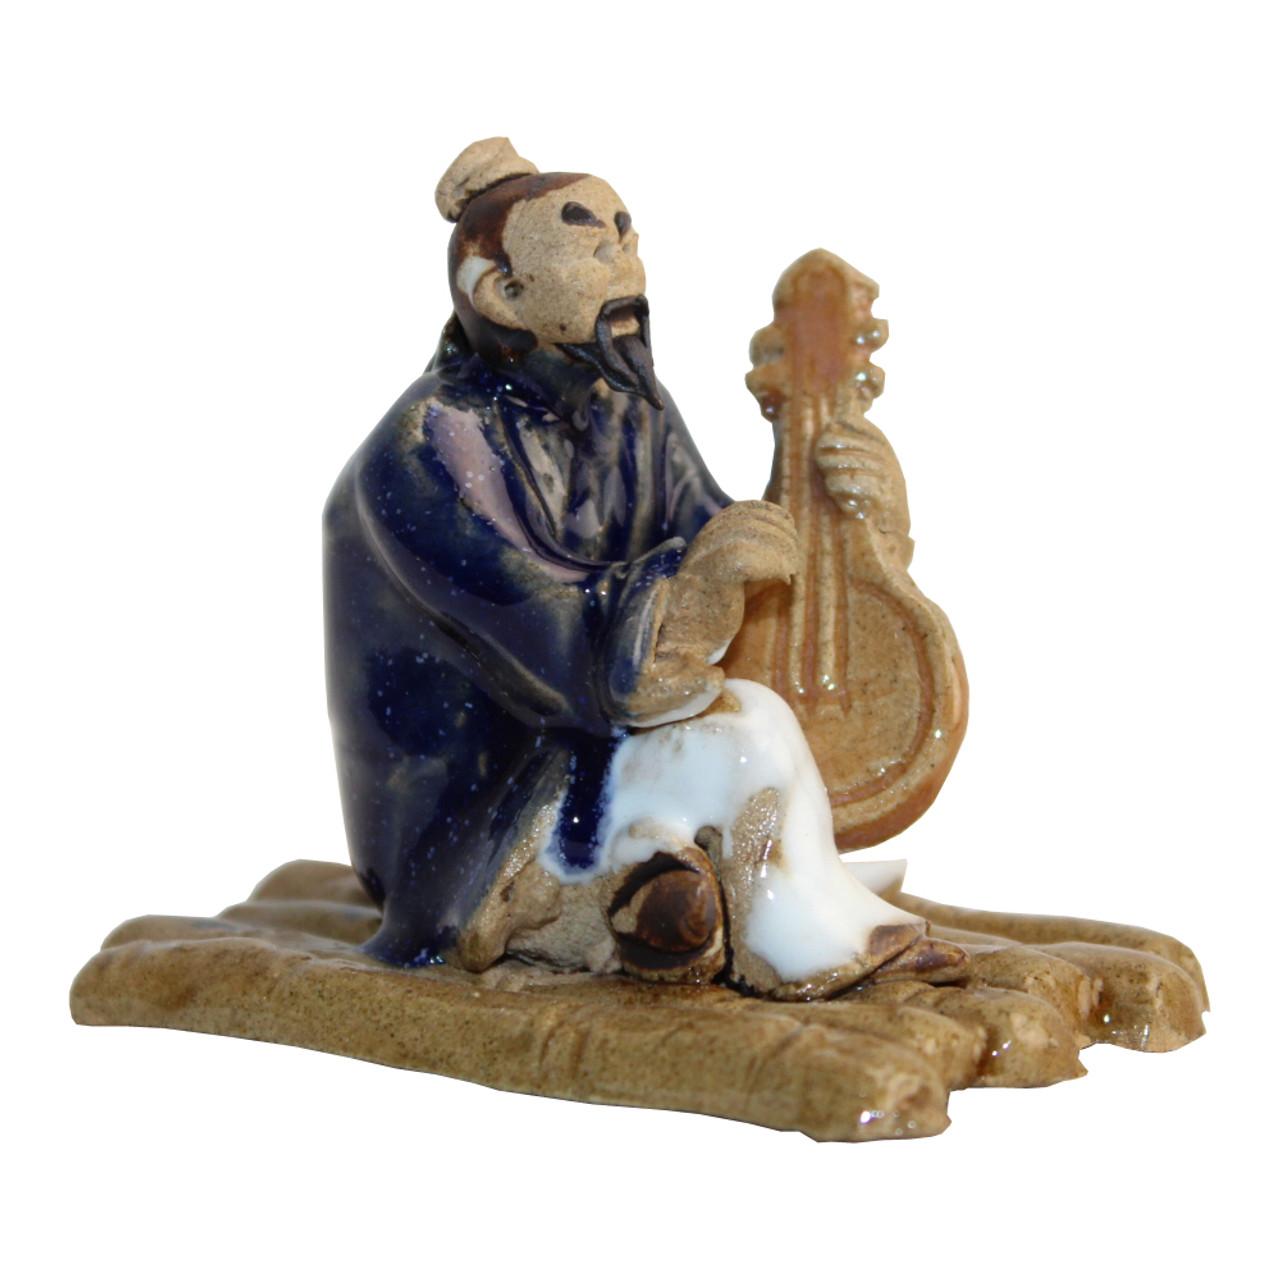 Chinese Figurine - Man sitting Playing Banjo (F-041)